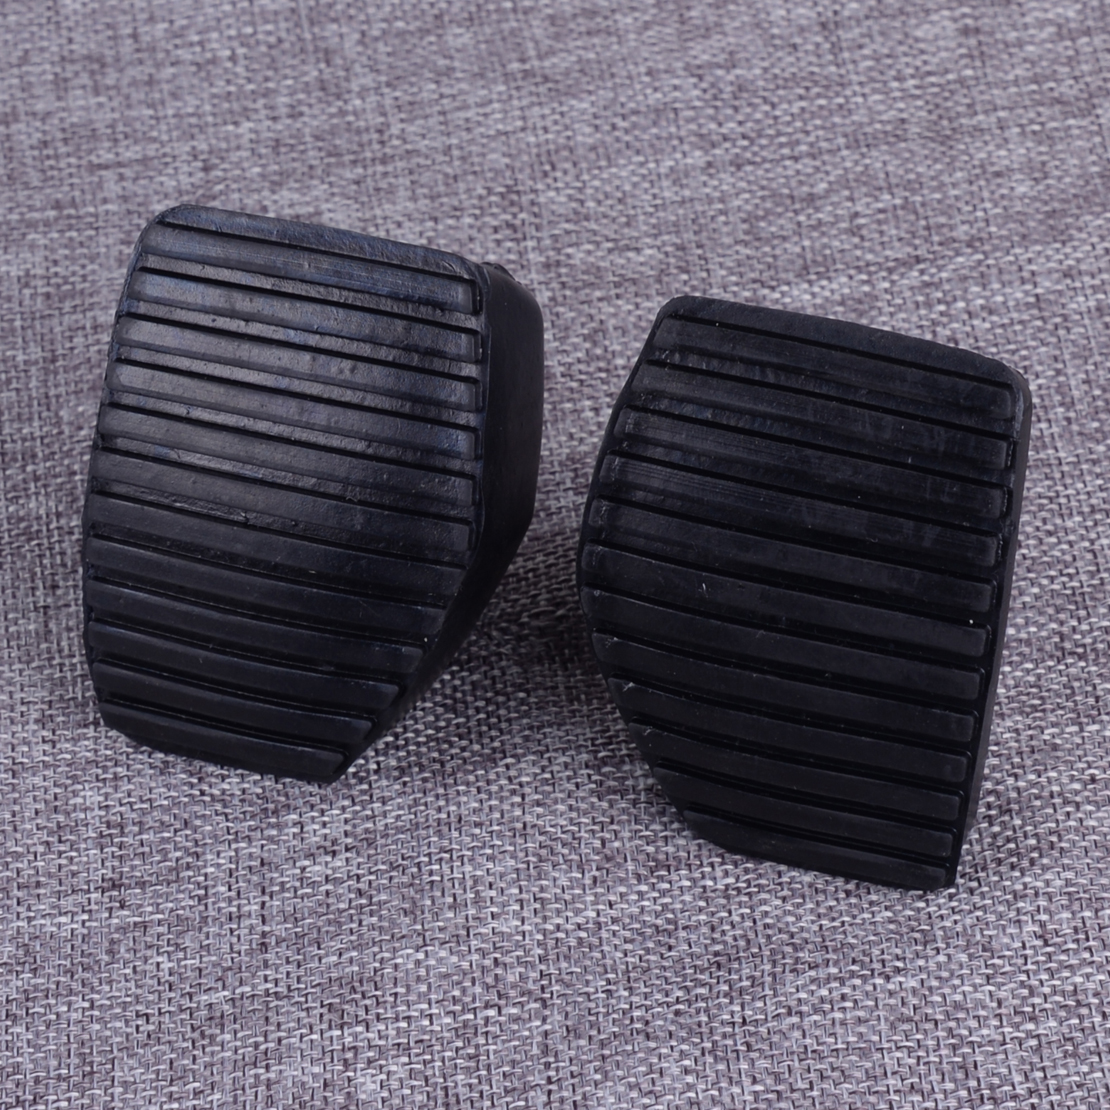 1 Pair Brake Pedal Rubber Clutch Pedal Cover Pad for Peu-geot Cit-roen 1007 207 208 301 C3 C4 C5 C6 C8